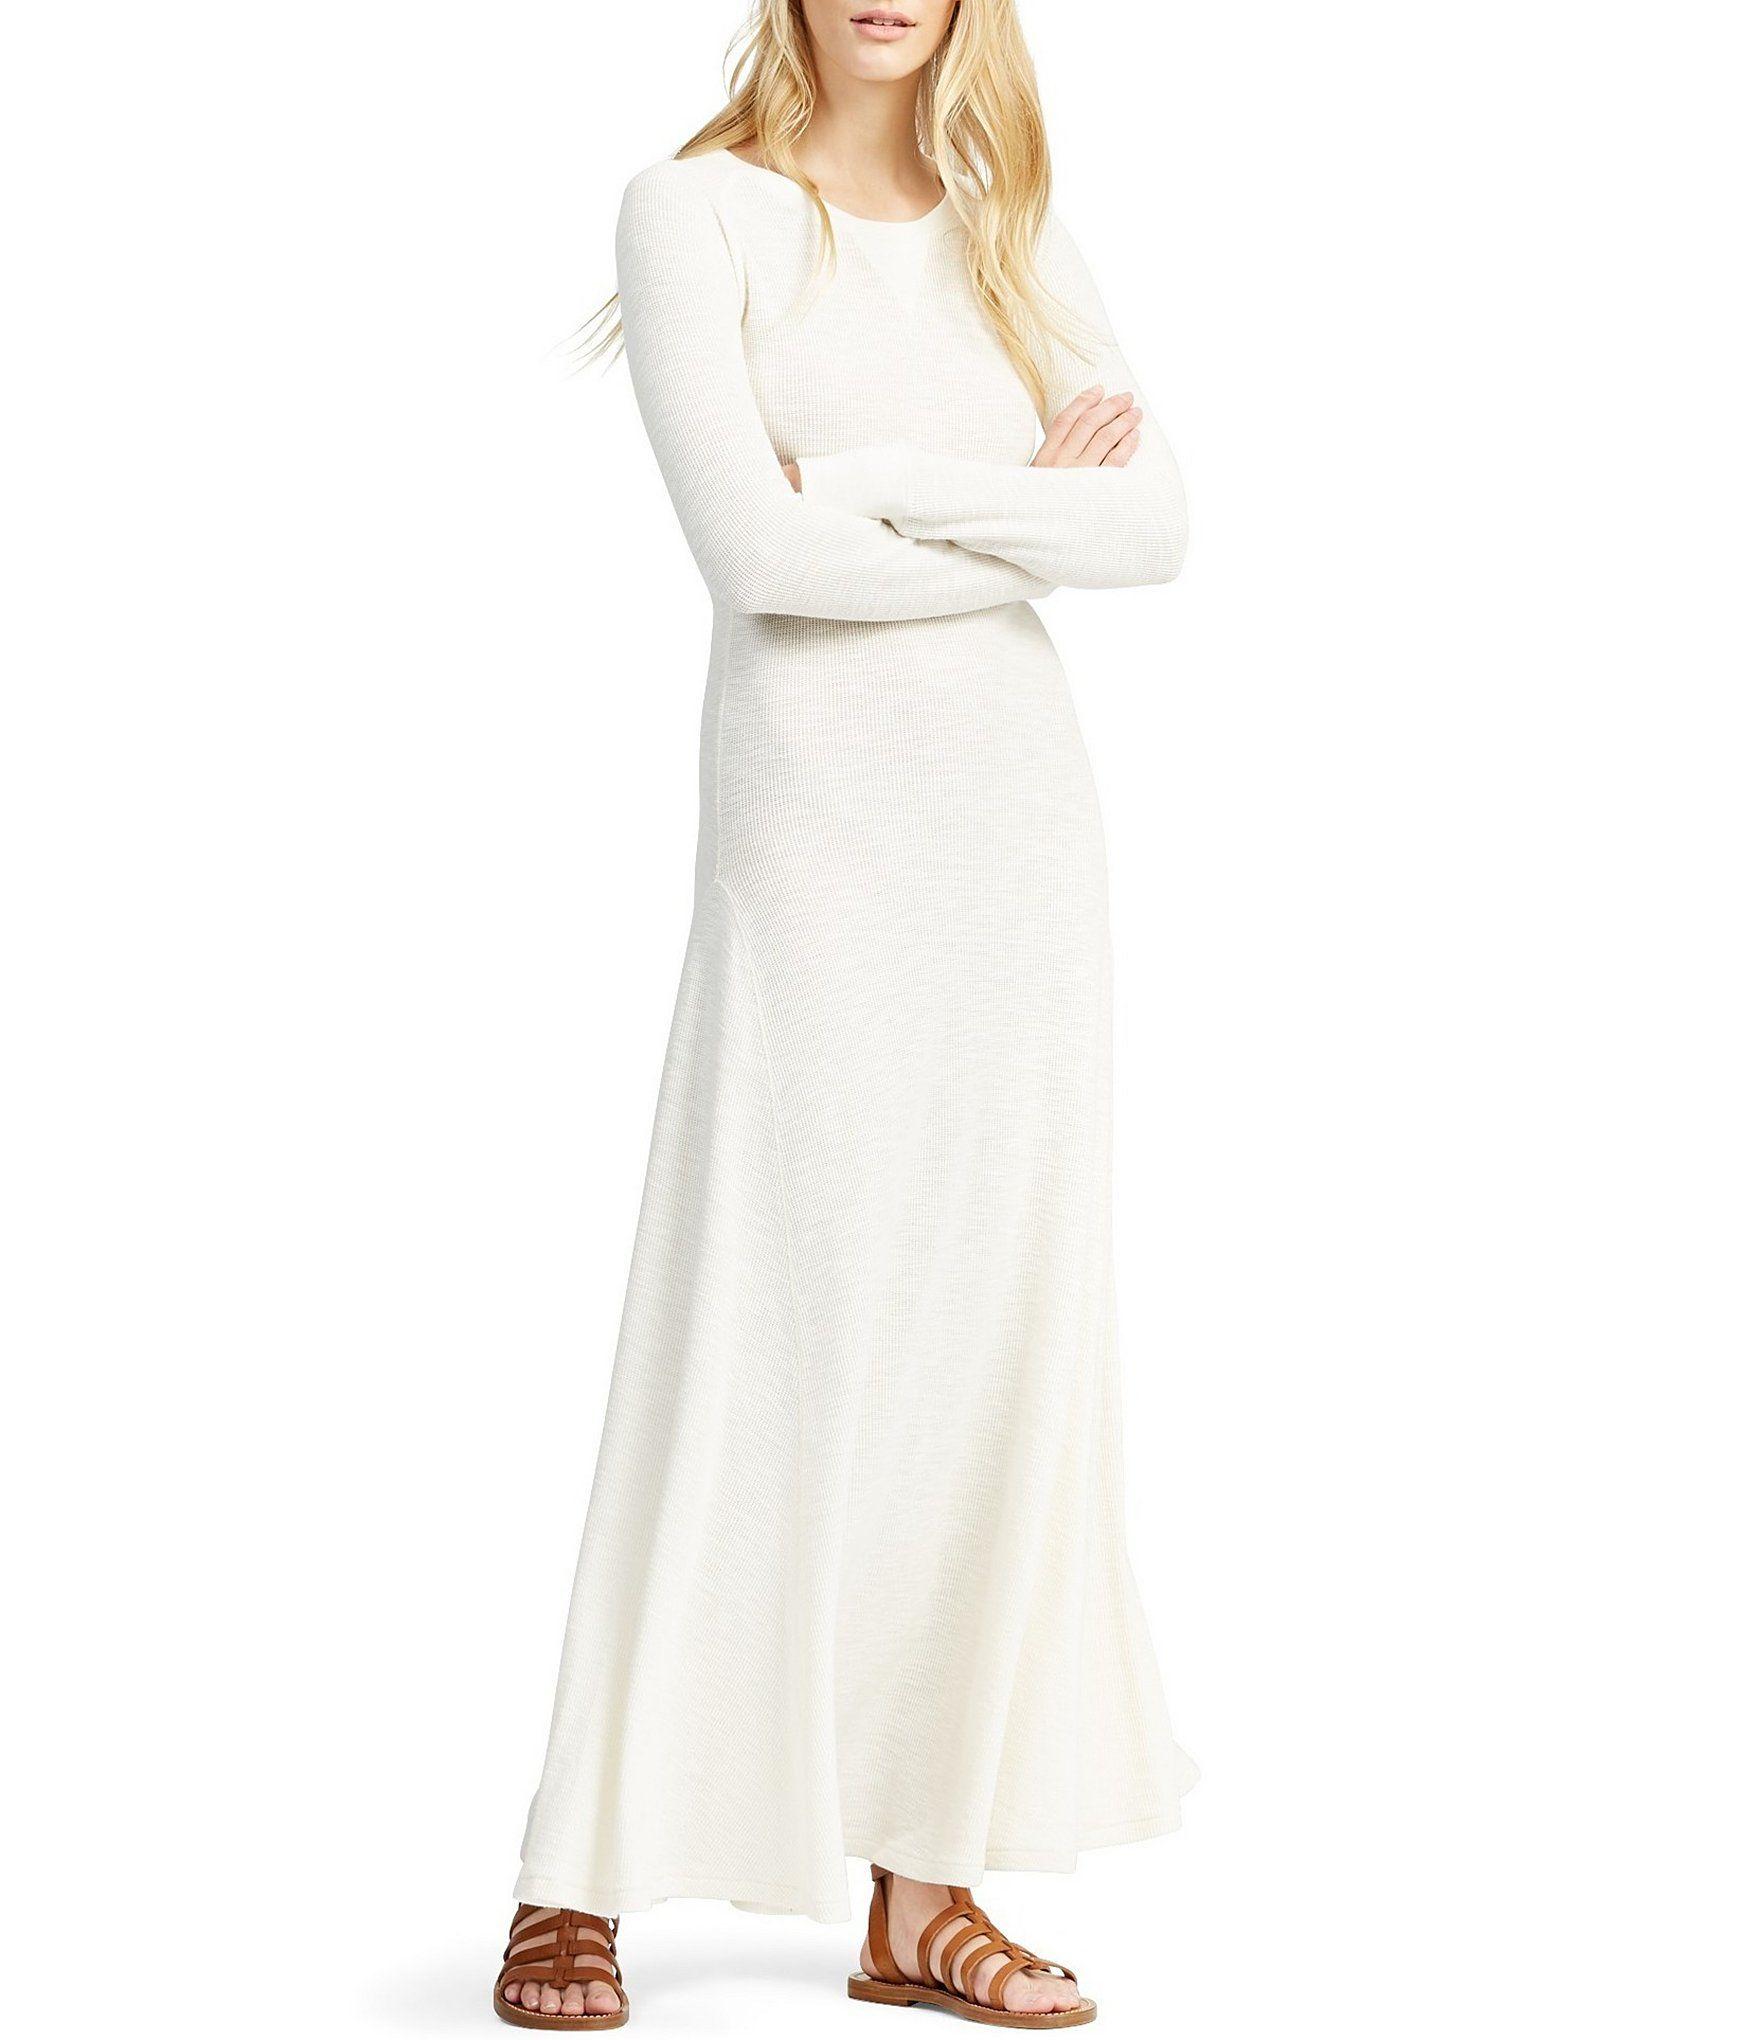 Polo Ralph Lauren Cotton Crew Neck Long Sleeve Maxi Dress Dillard S Maxi Dress Cotton Dresses With Leggings Cotton Maxi [ 2040 x 1760 Pixel ]